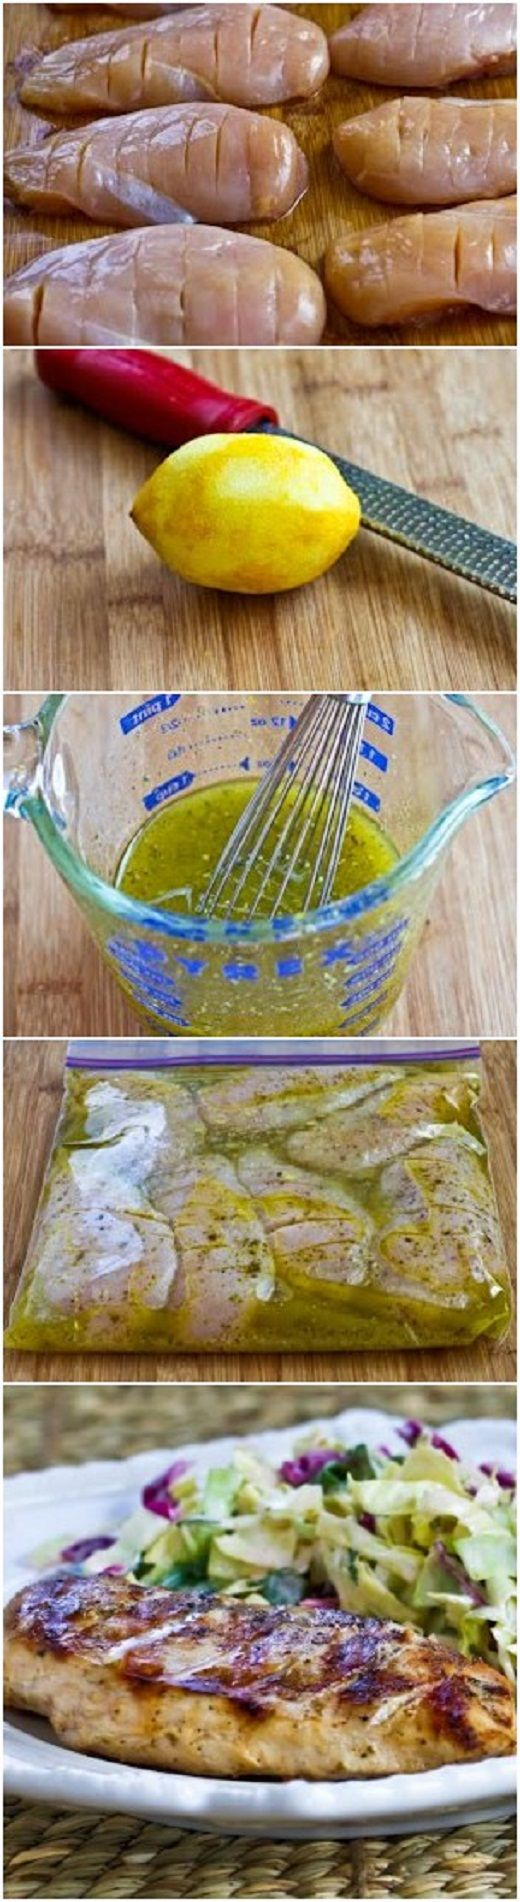 Best Recipes, #12 Greek Grilled Chicken | Cooking & Stuff | Pinterest